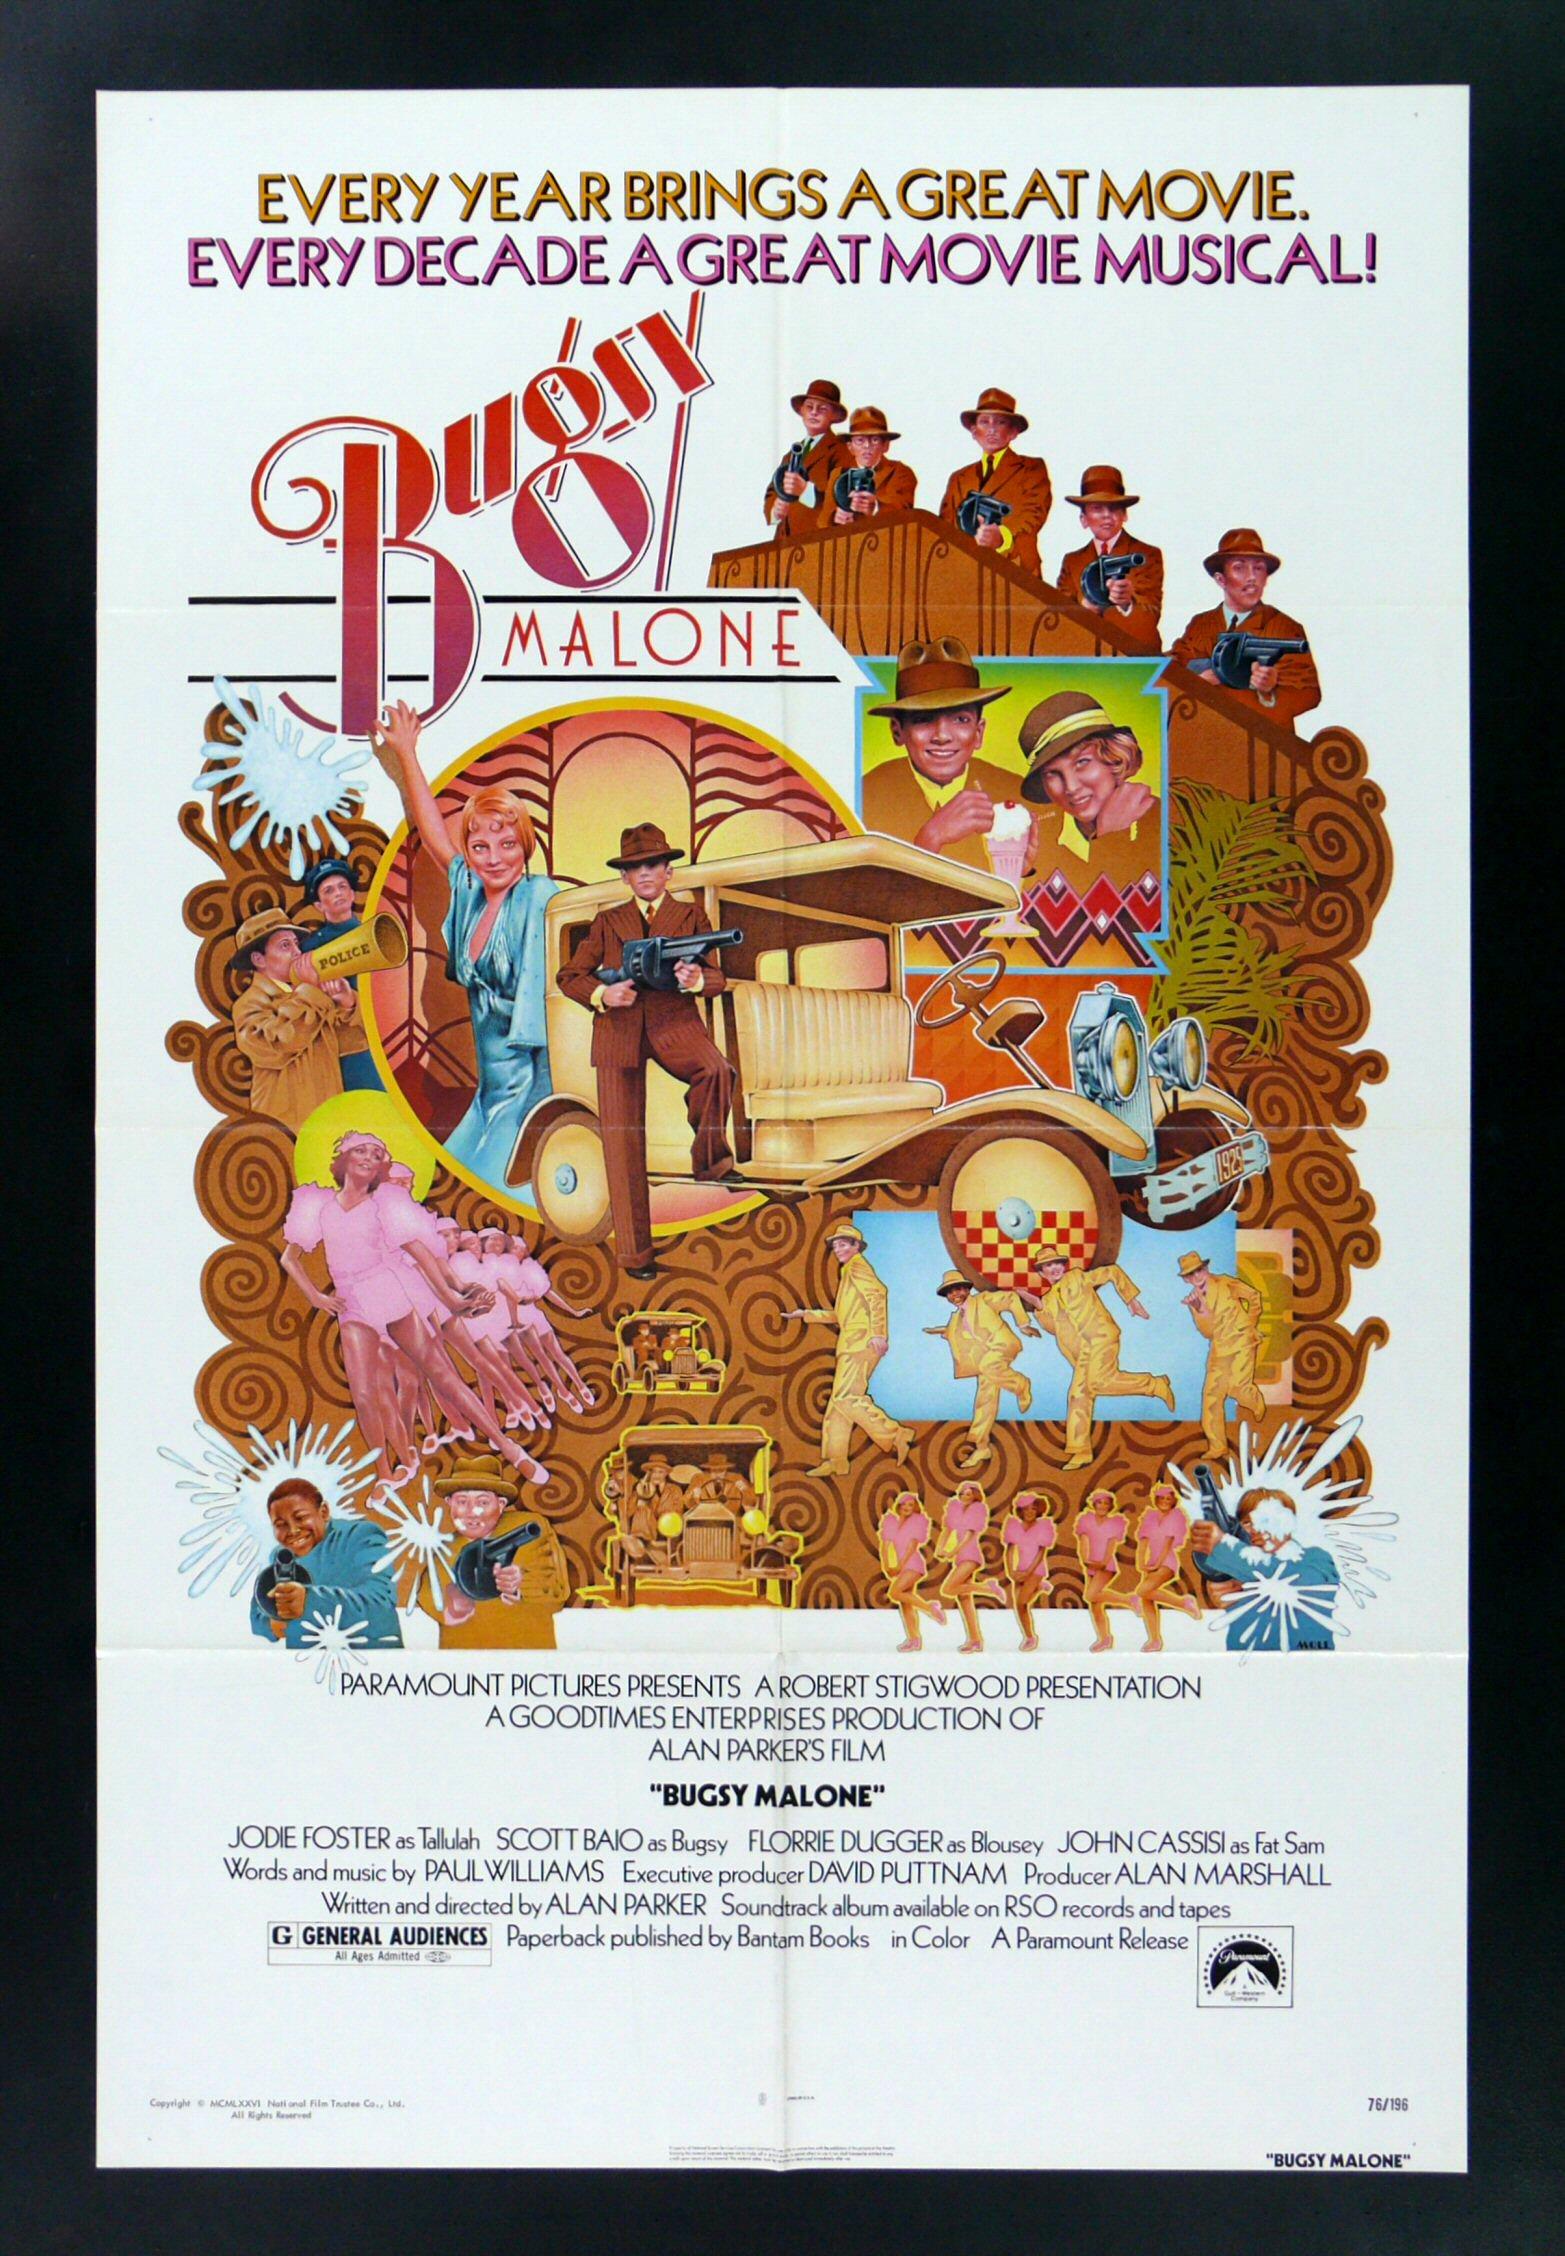 Bugsy Malone Poster Bugsy Malone Quando as